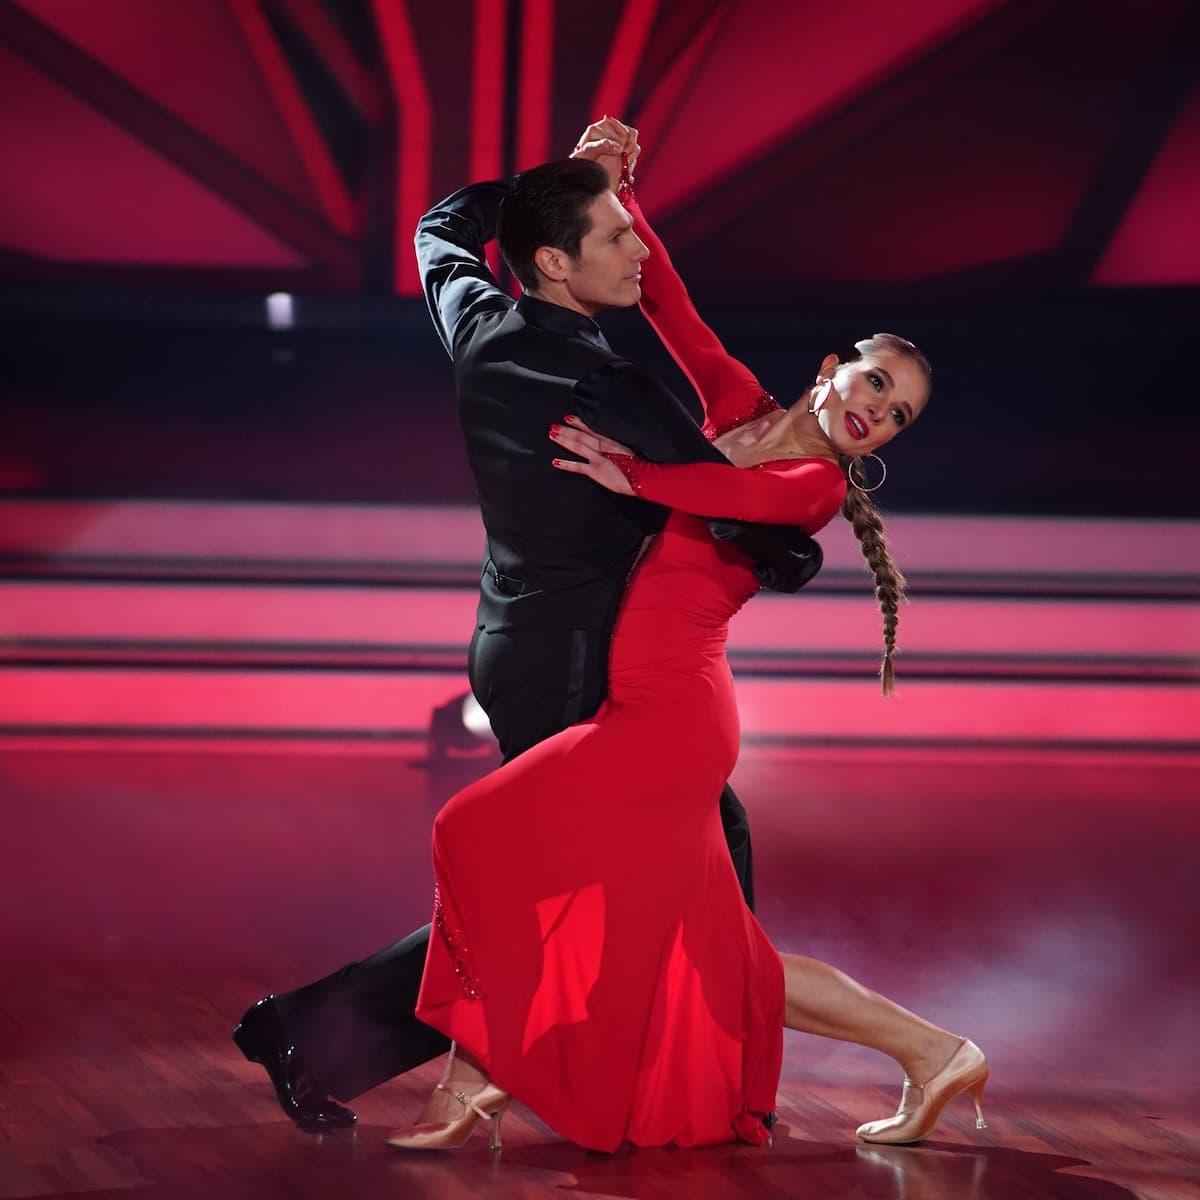 Christian Polanc und Lola Weippert bei Let's dance am 12.3.2021